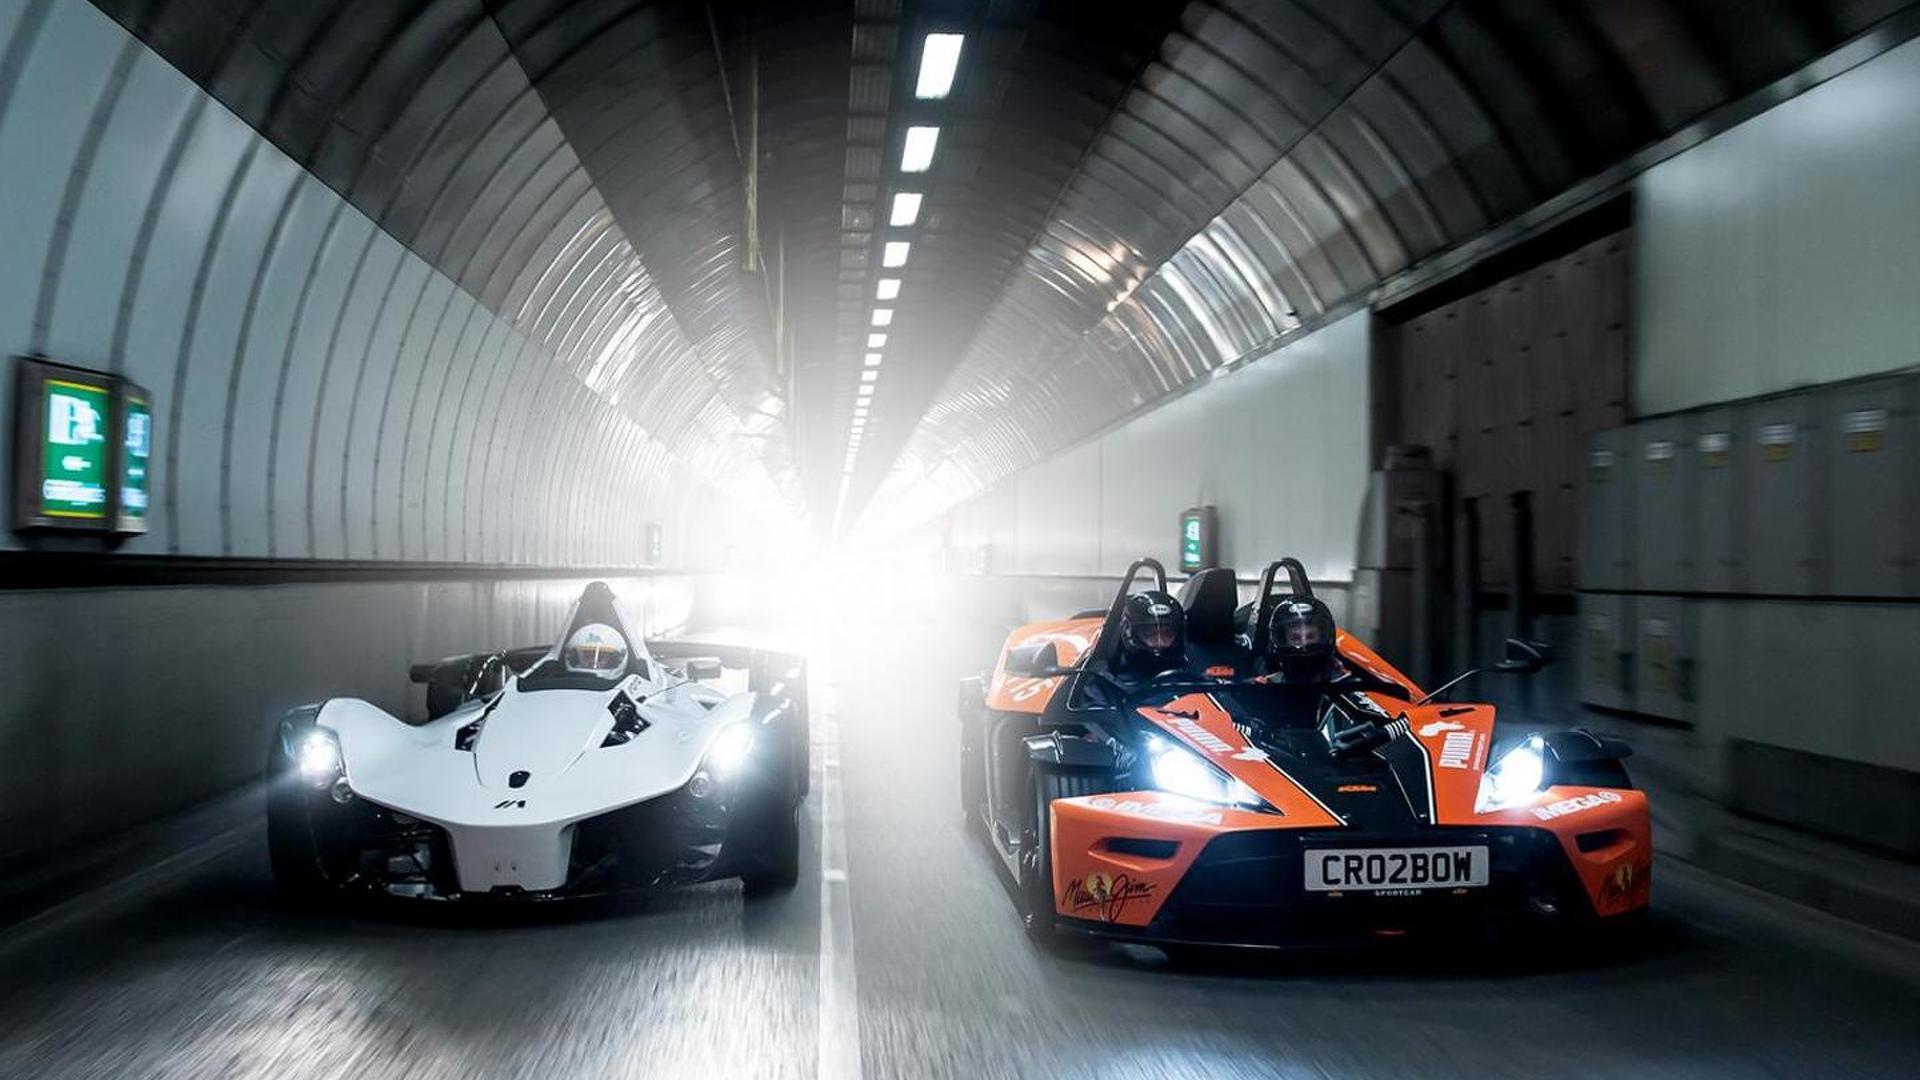 BAC Mono, Ariel Atom, KTM X-BOW and Caterham R300 trip to London [video]